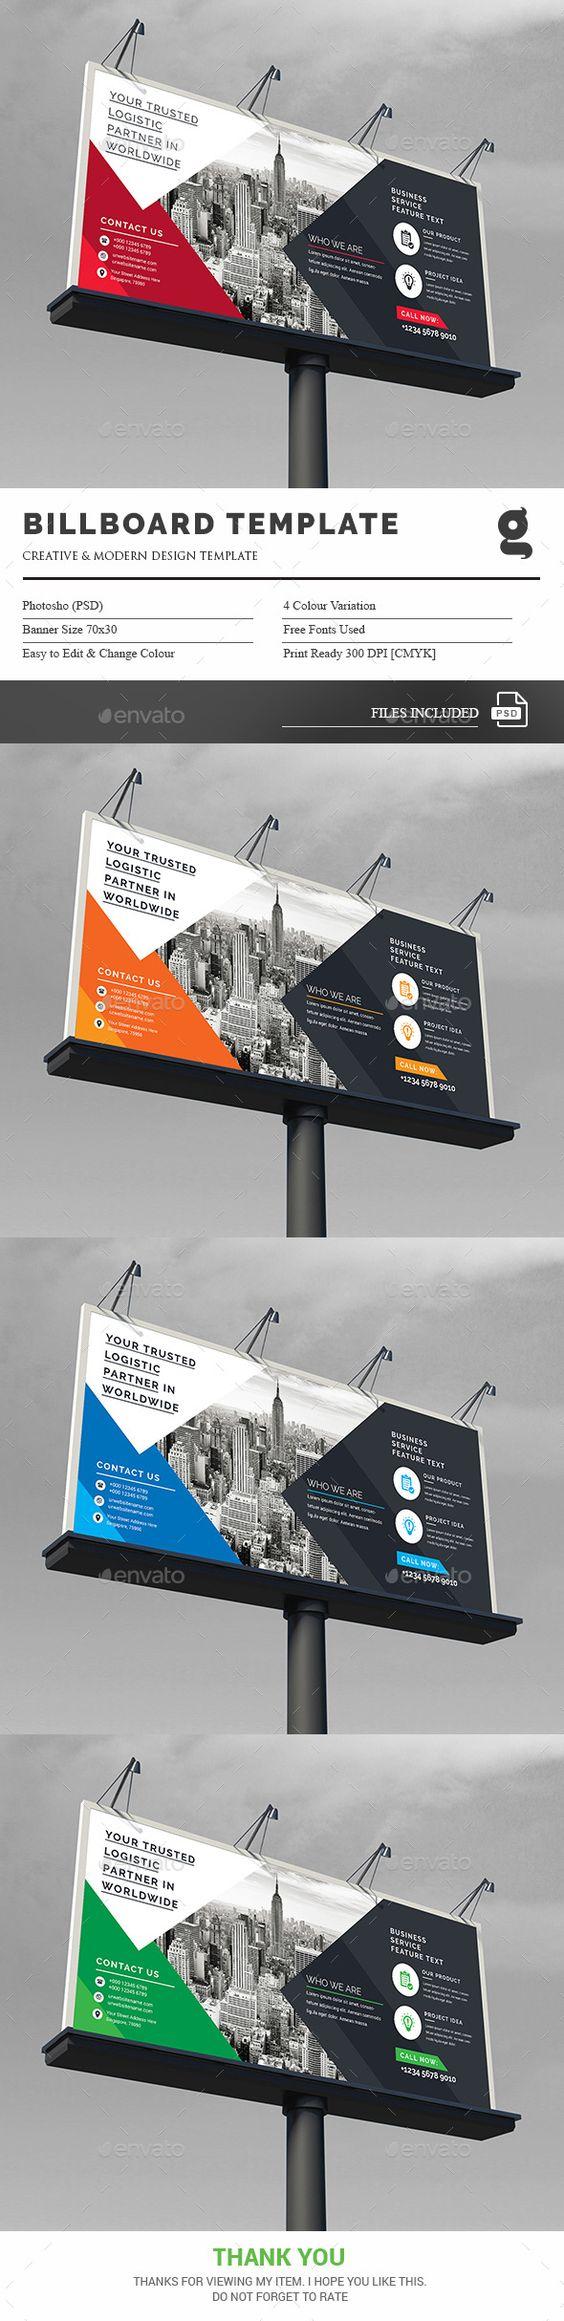 Billboard Template PSD. Download here: https://graphicriver.net/item/billboard-template/17377702?ref=ksioks